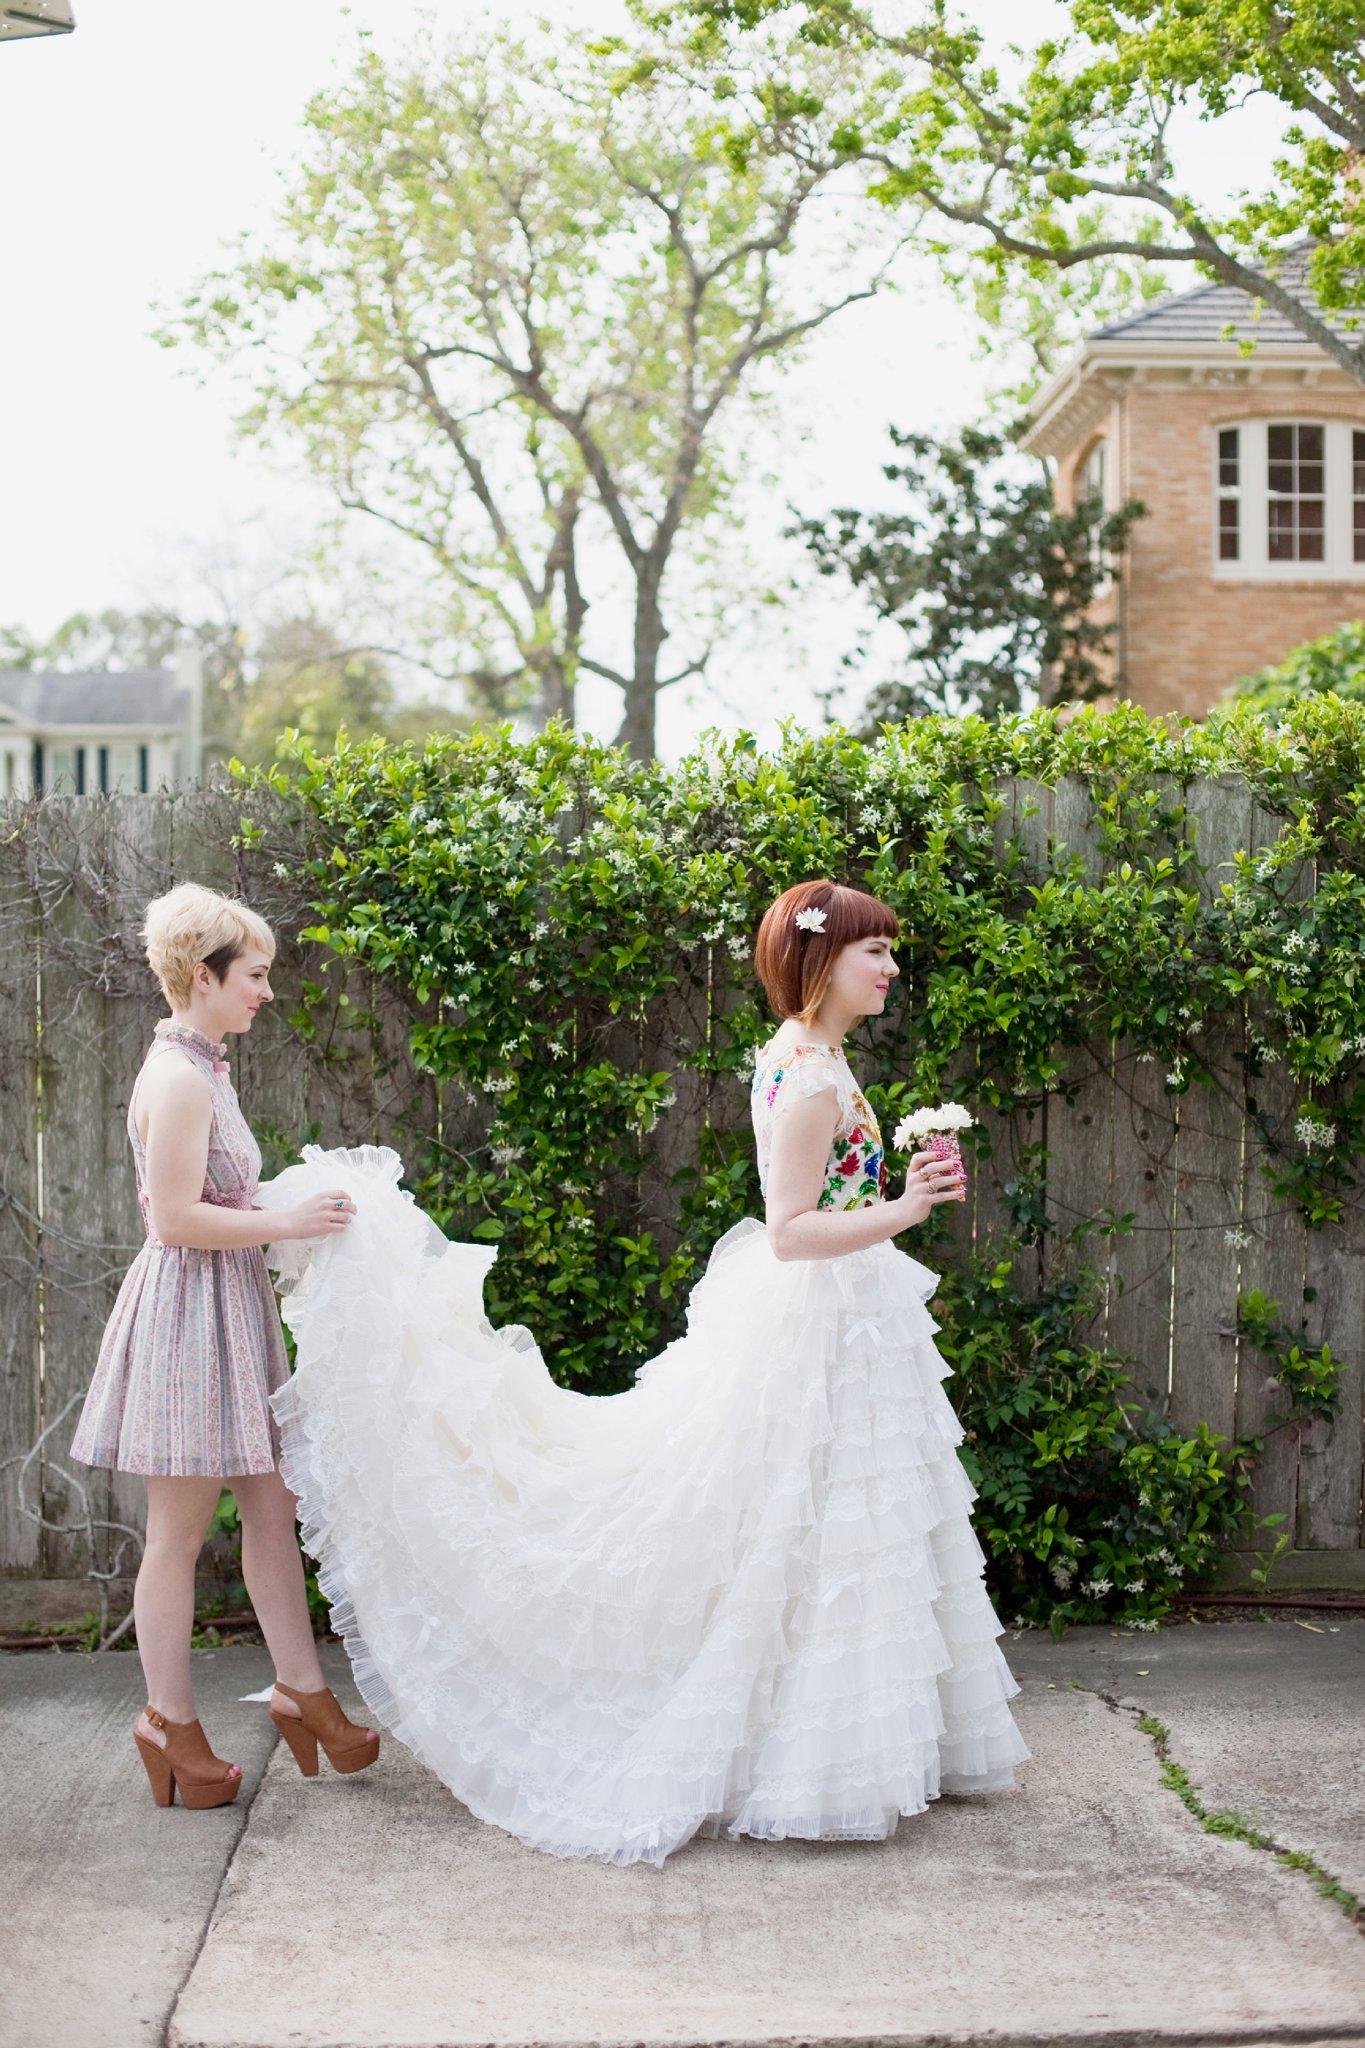 eclectic texan wedding the connoisseur of cute wedding texas wedding photographer shannon griffin photography_0014.jpg